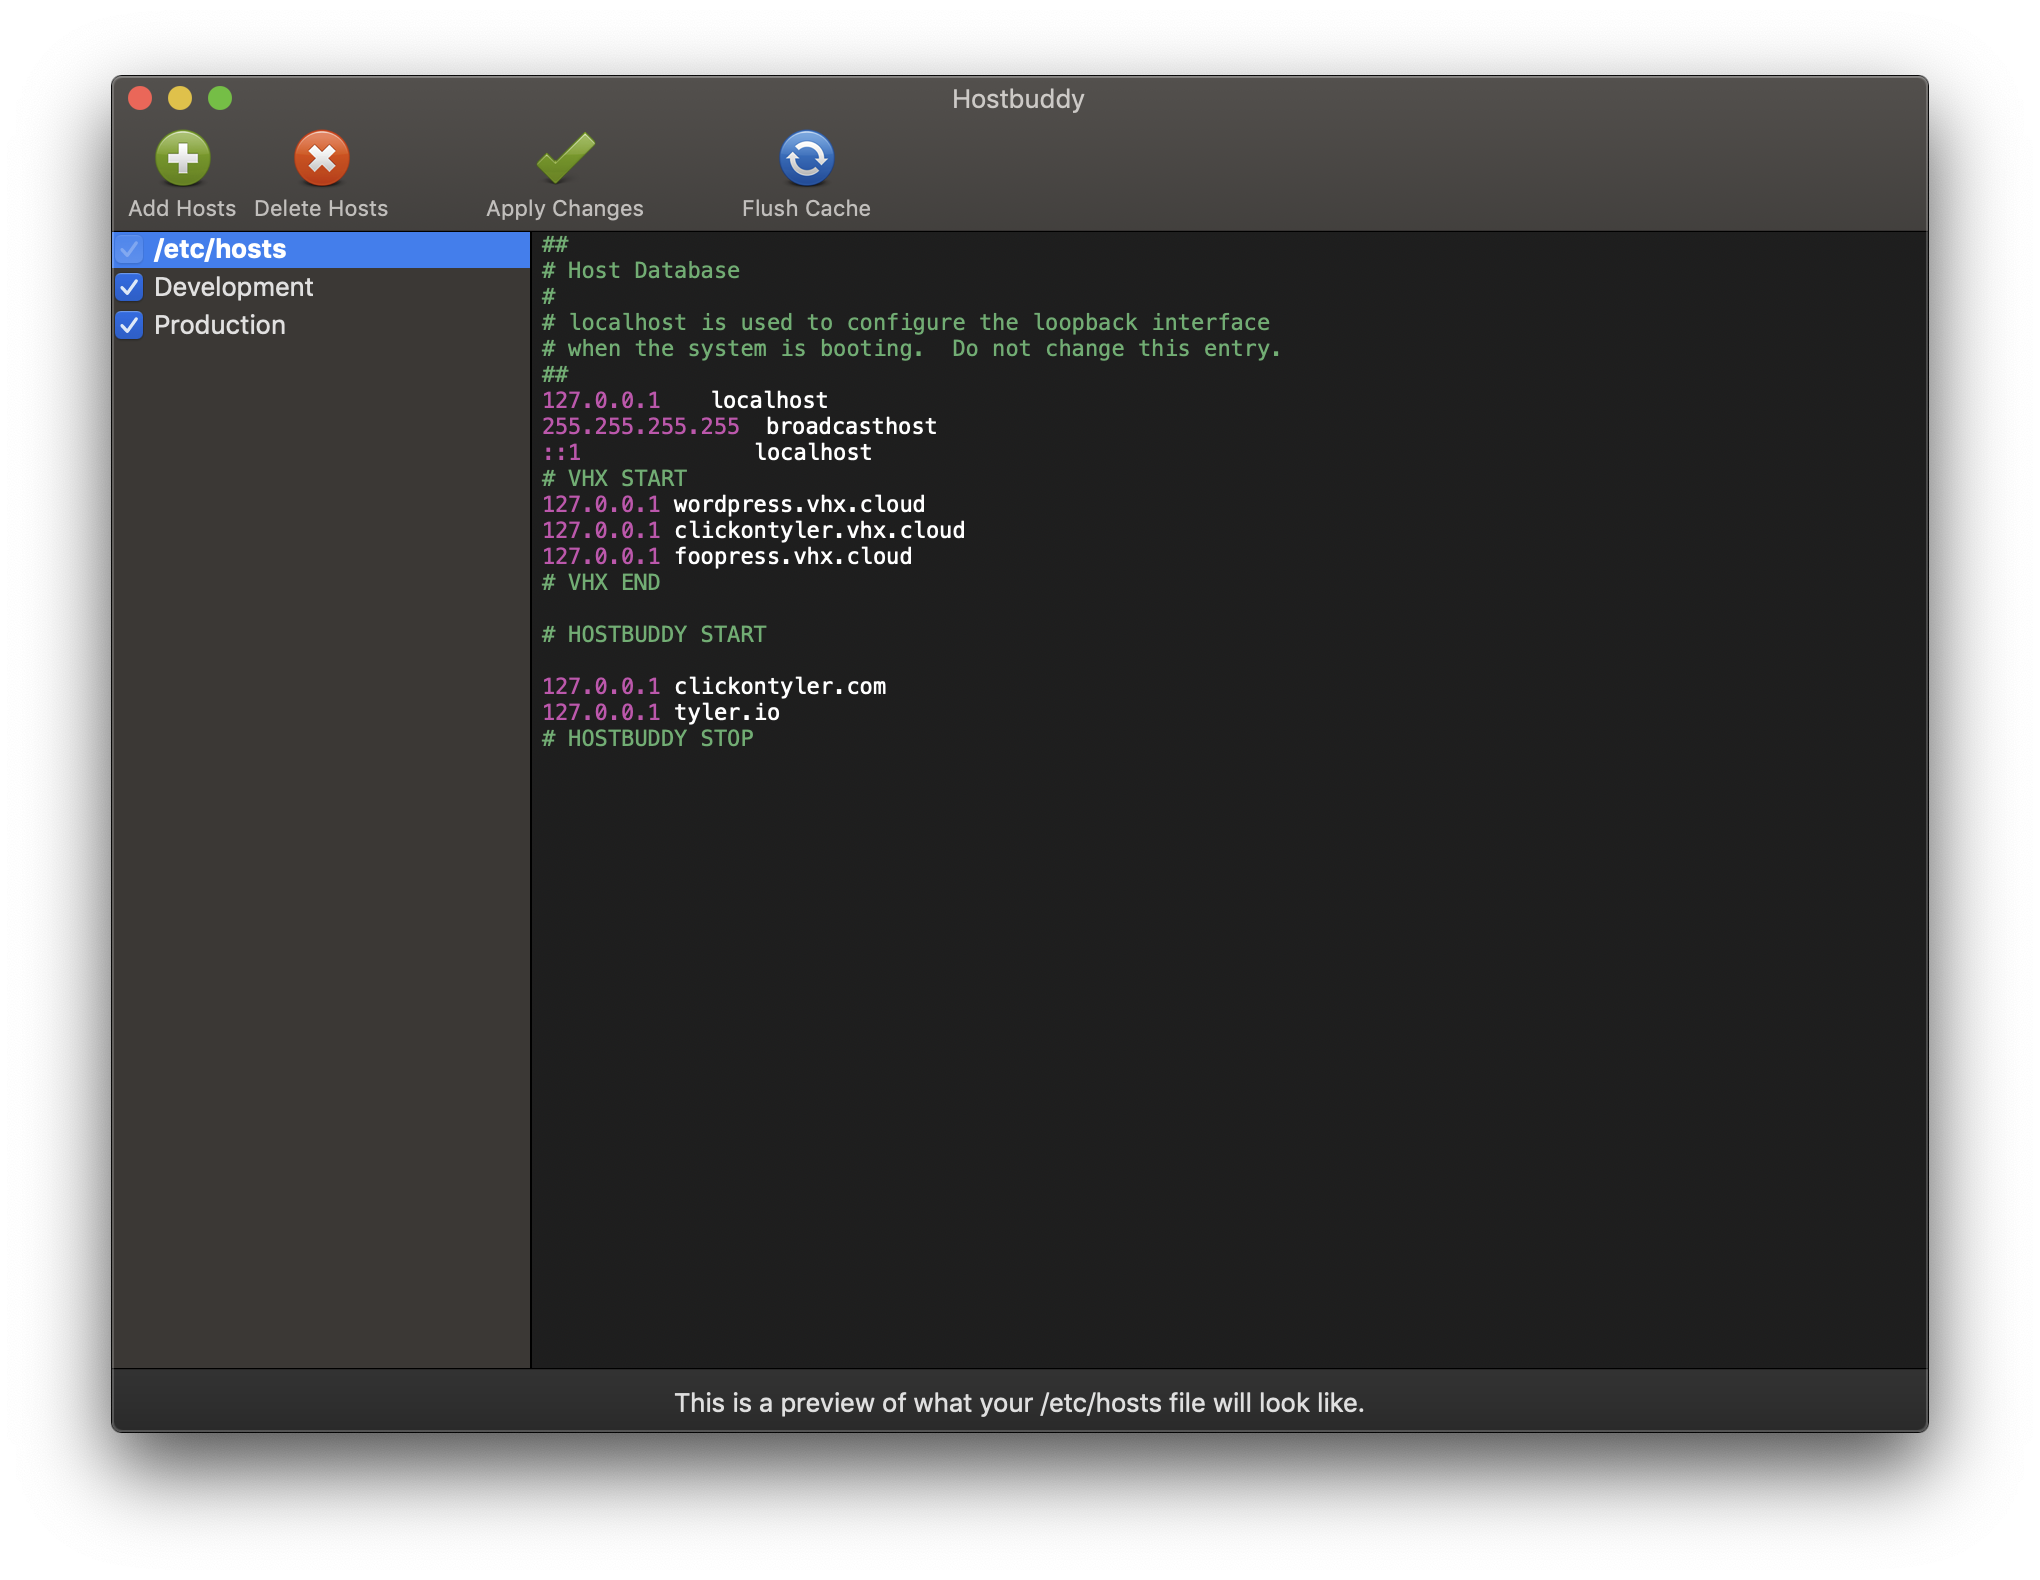 hostbuddy-screenshot1.png